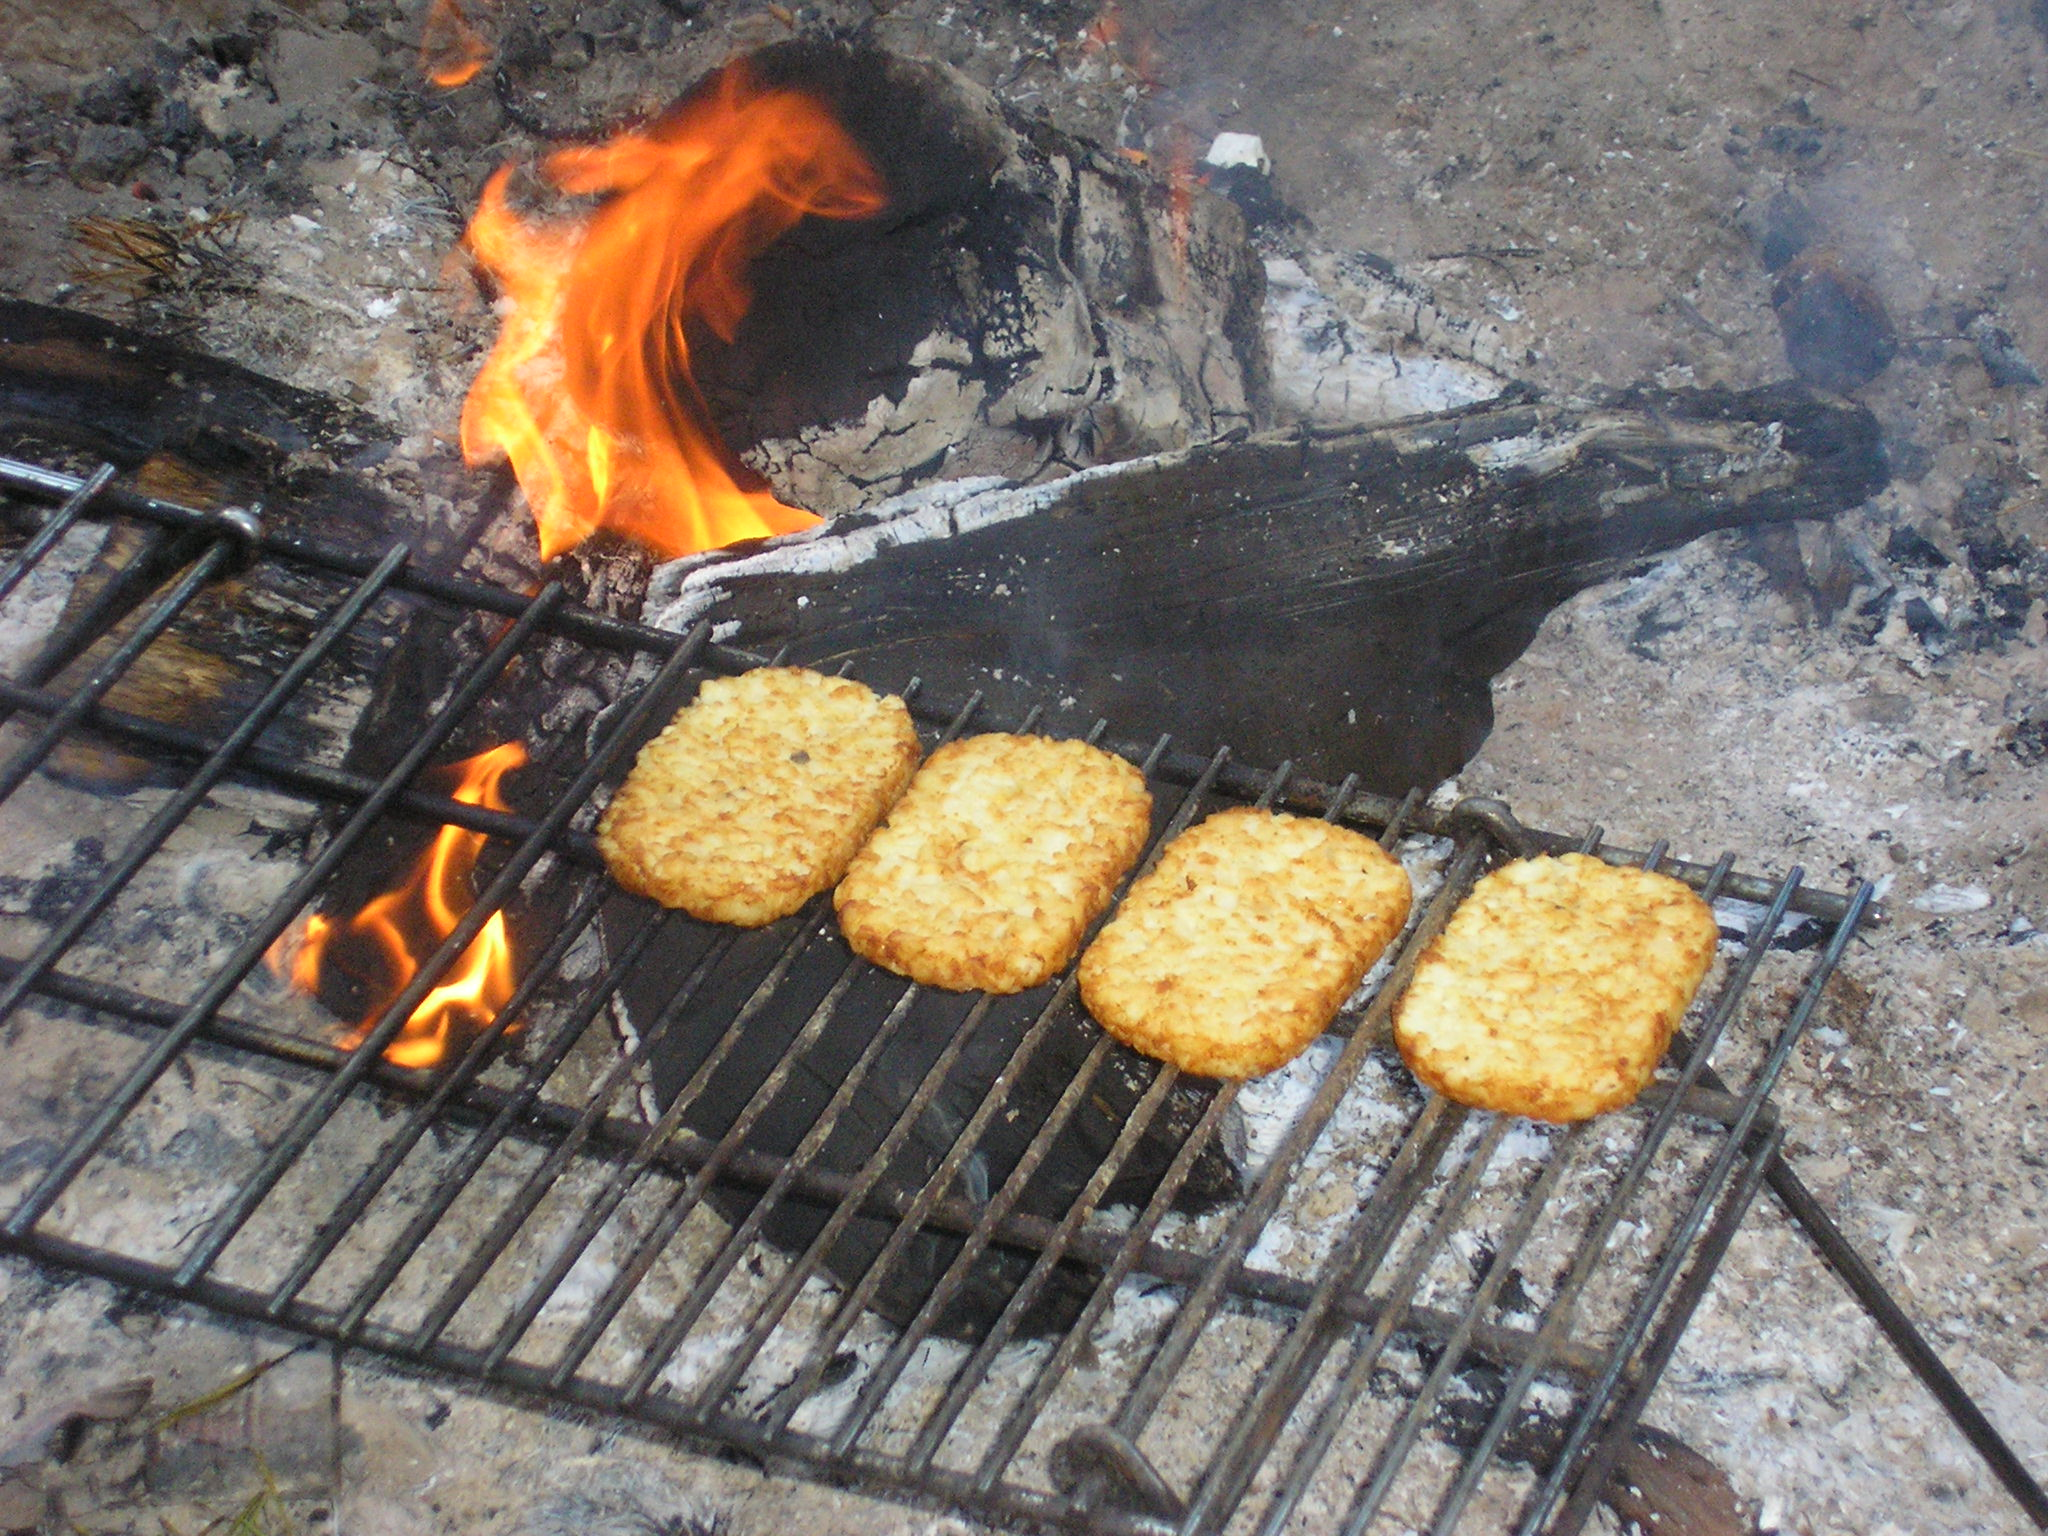 Improvised cooking of Hash Brown Potatoes